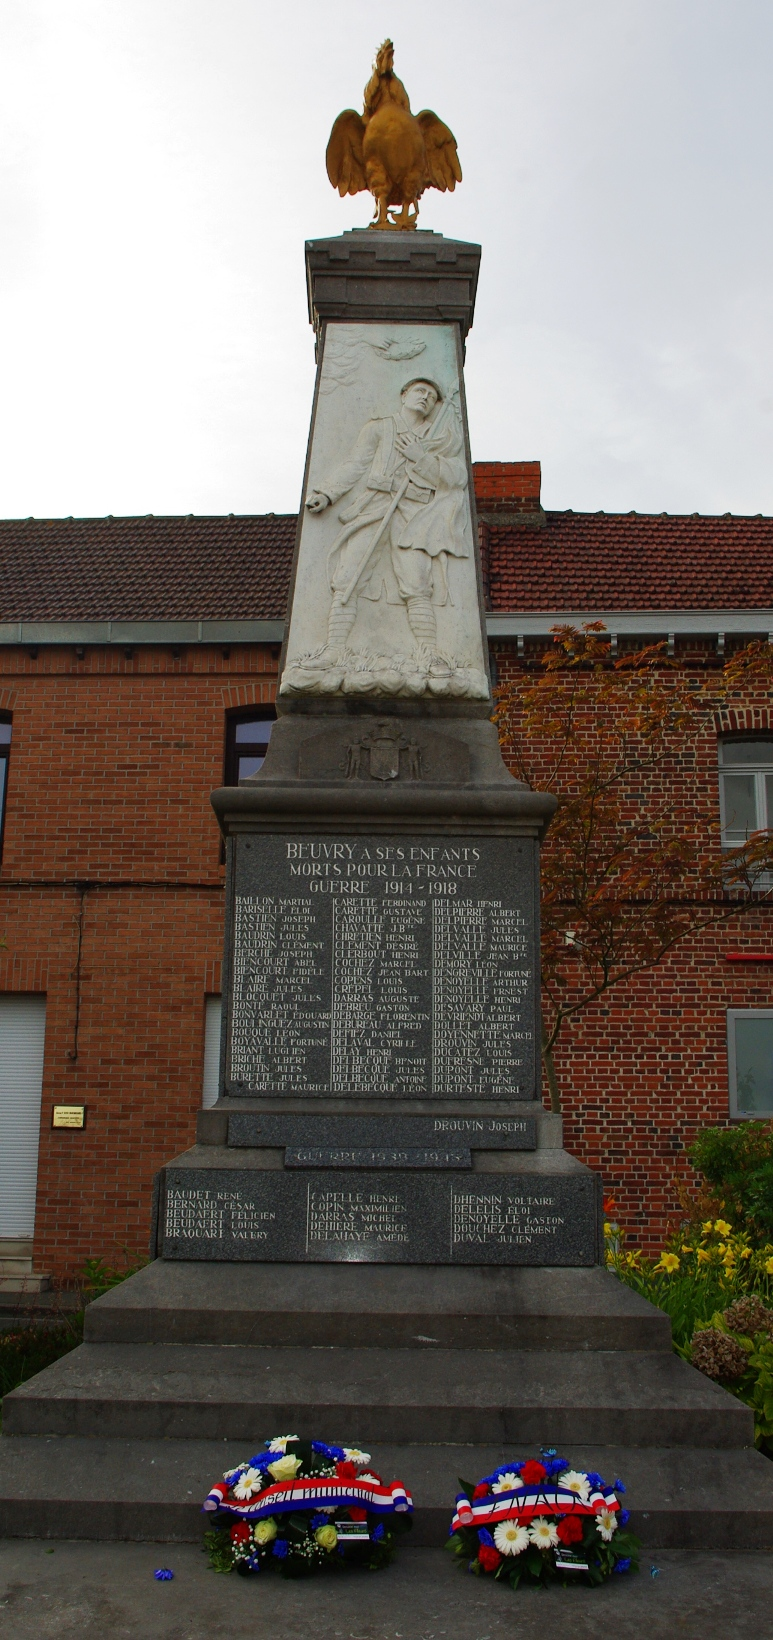 18 juin 2015 monument aux morts Beuvry